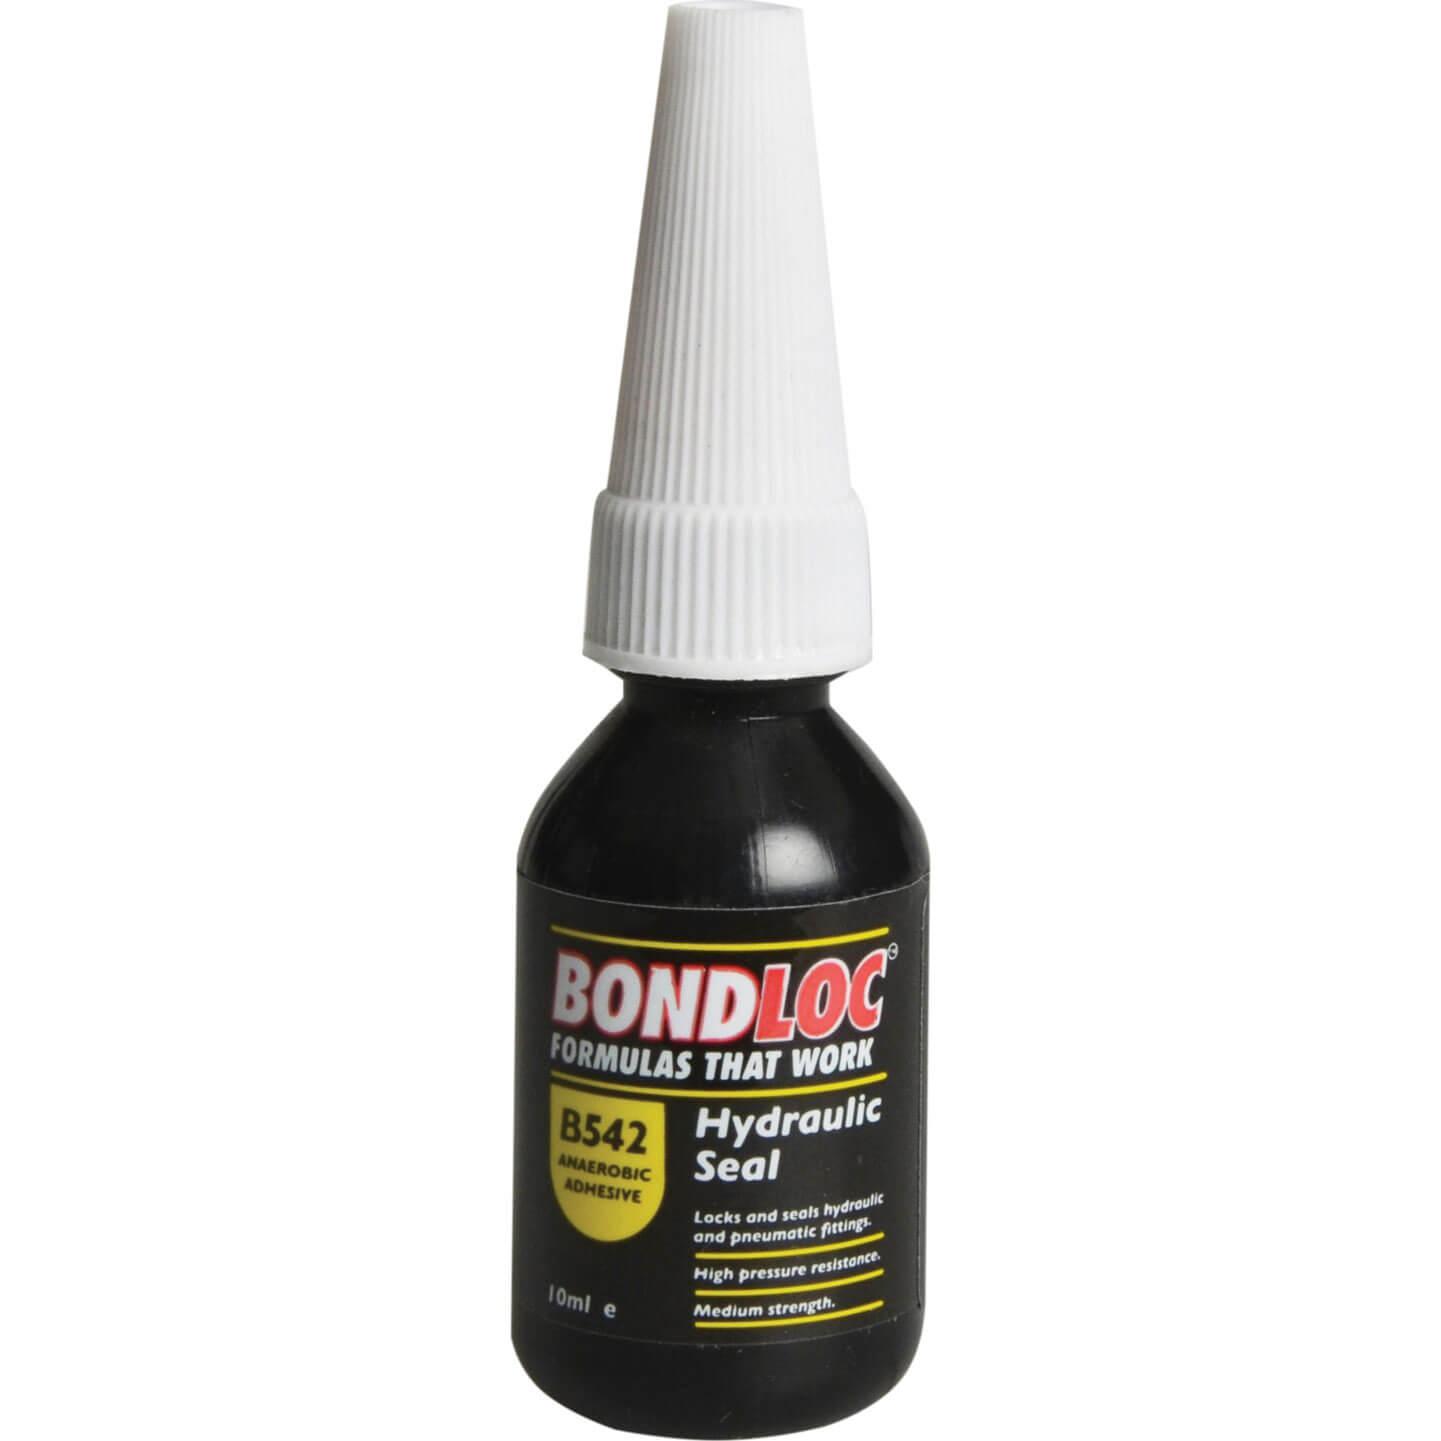 Bondloc B542 Hydraulic Sealant for Pneumatic Fittings 10ml